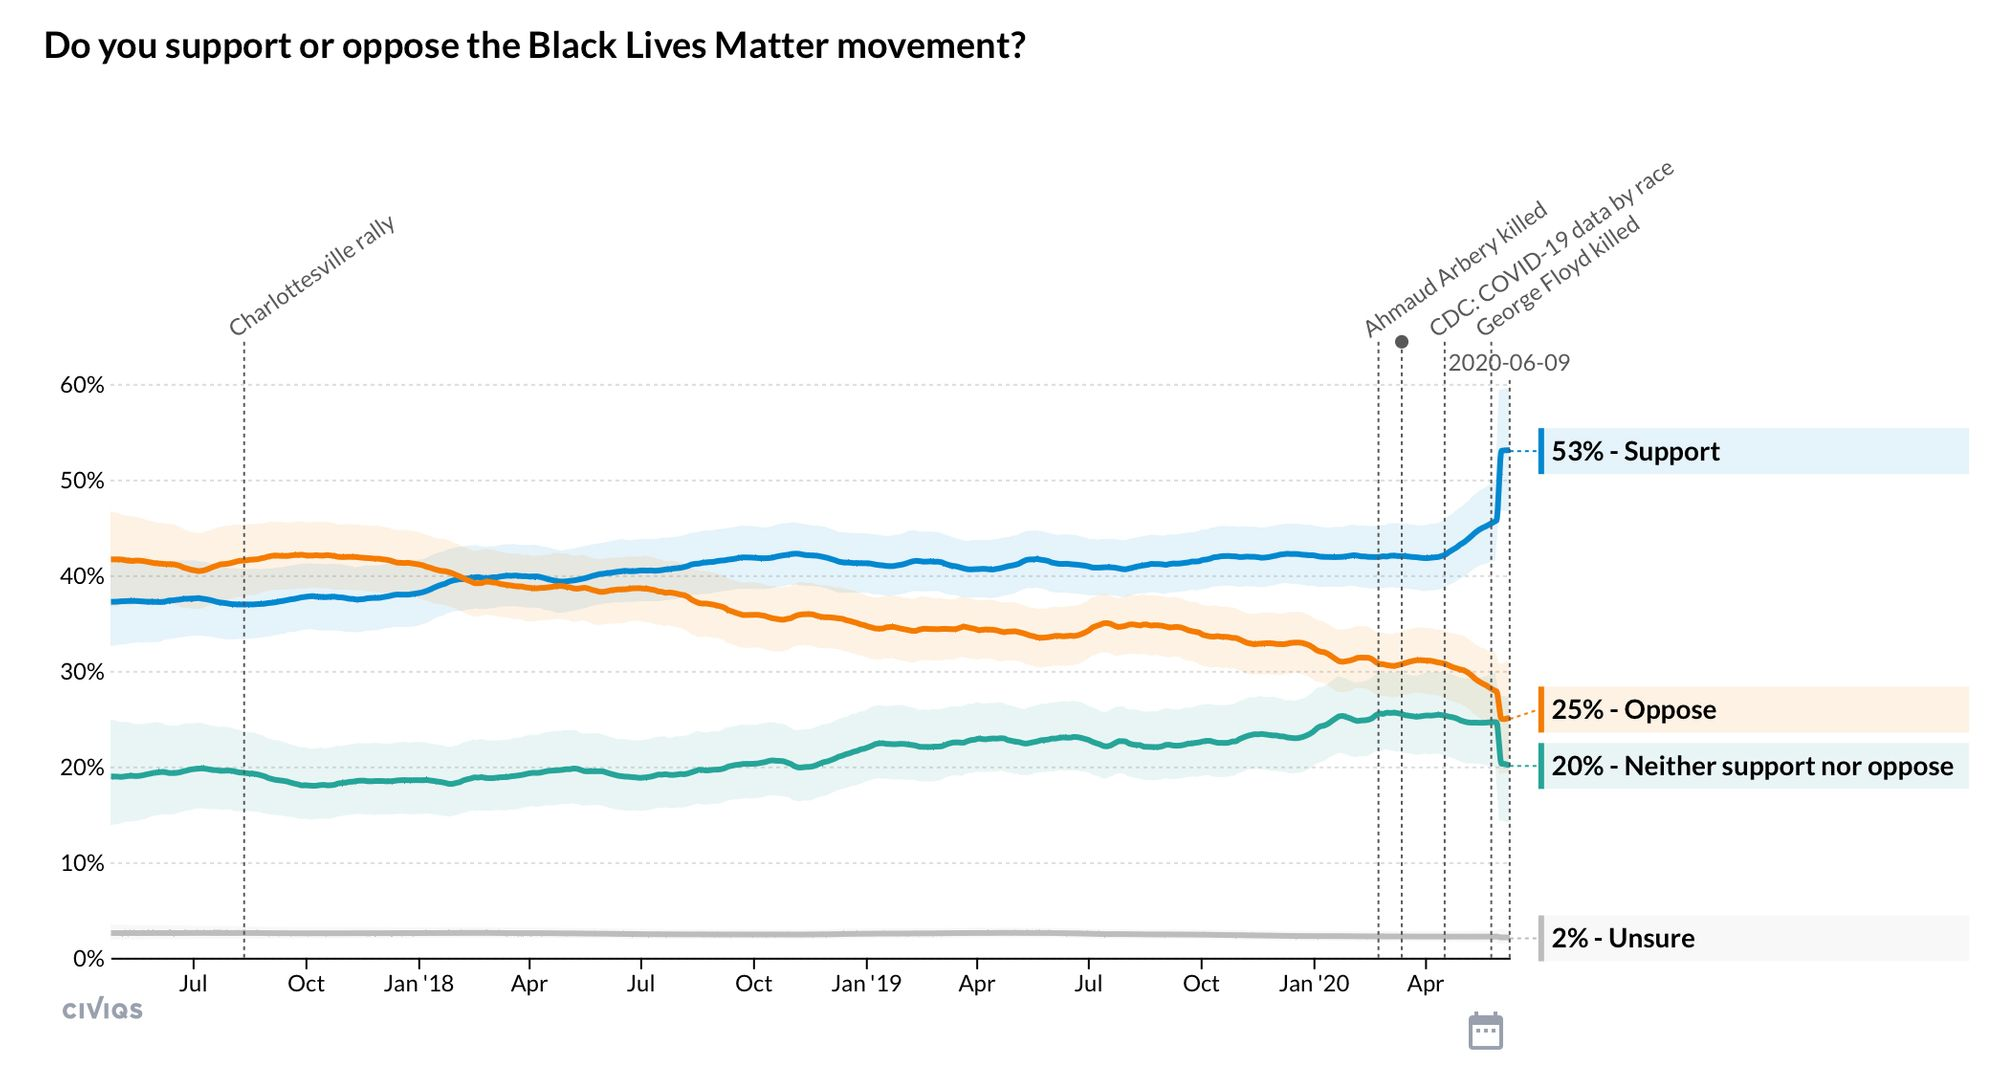 Source: https://civiqs.com/results/black_lives_matter?uncertainty=true&annotations=true&zoomIn=true